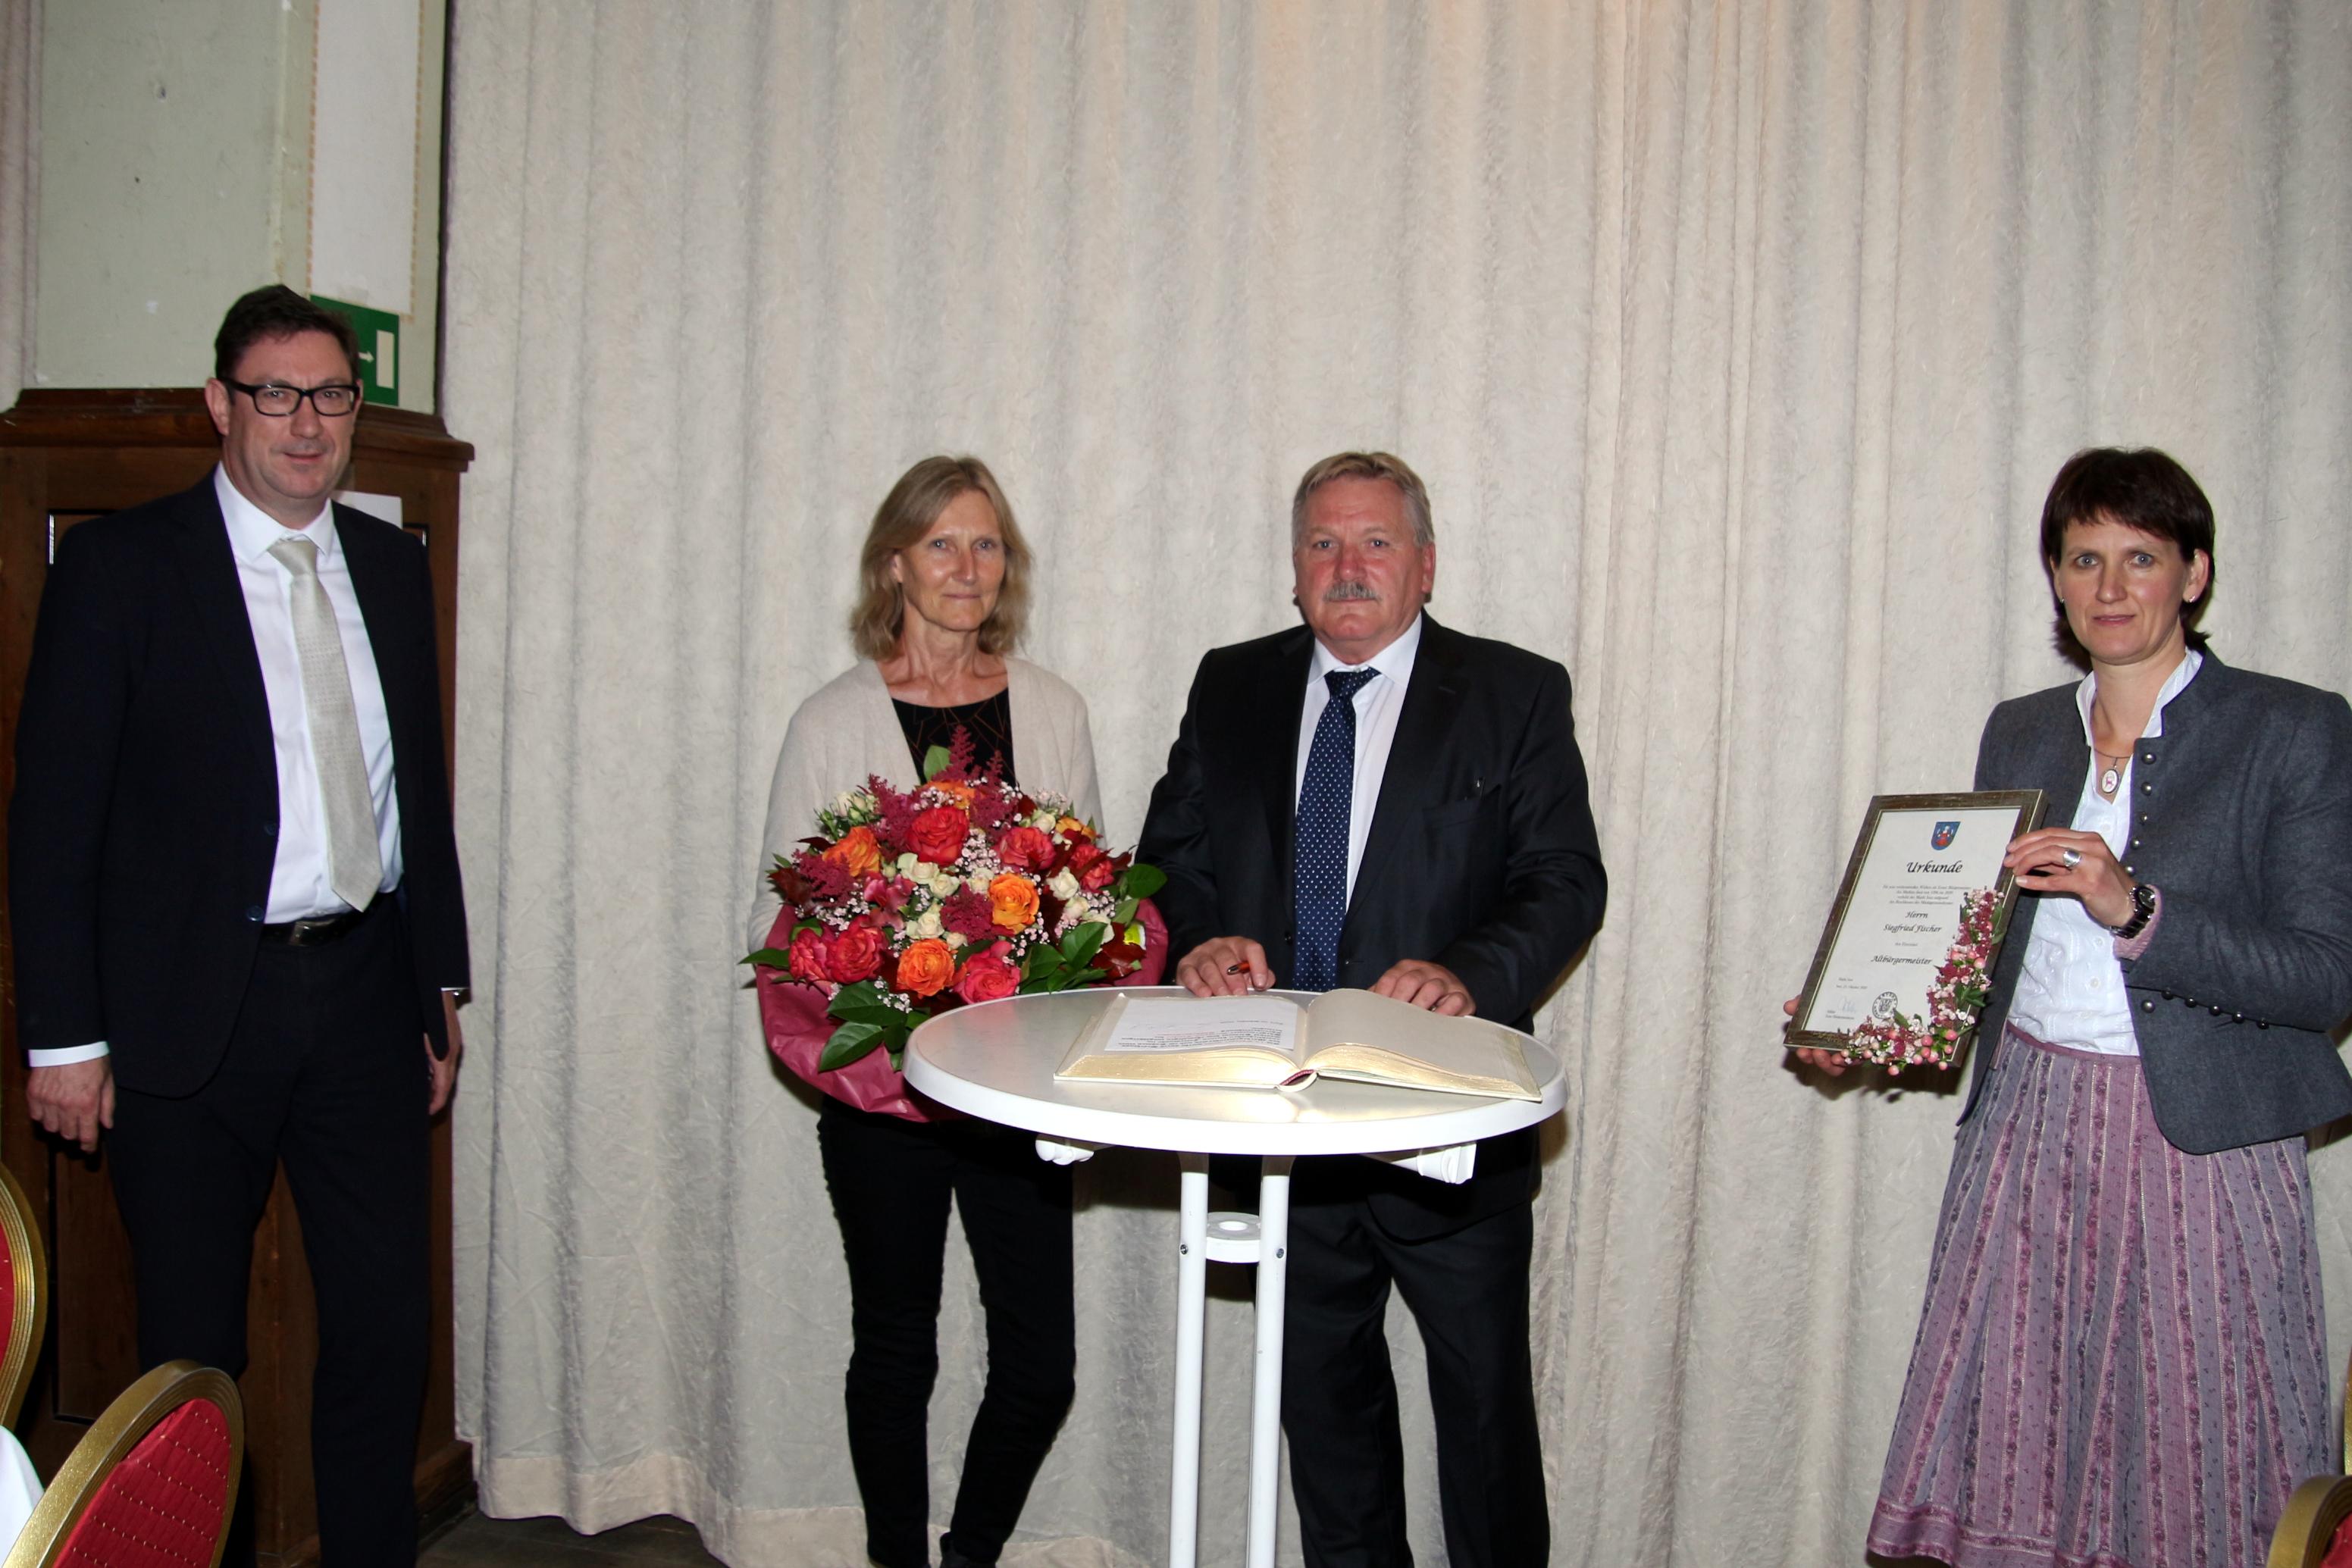 2020-10-13 Isen Altbürgermeister (58)